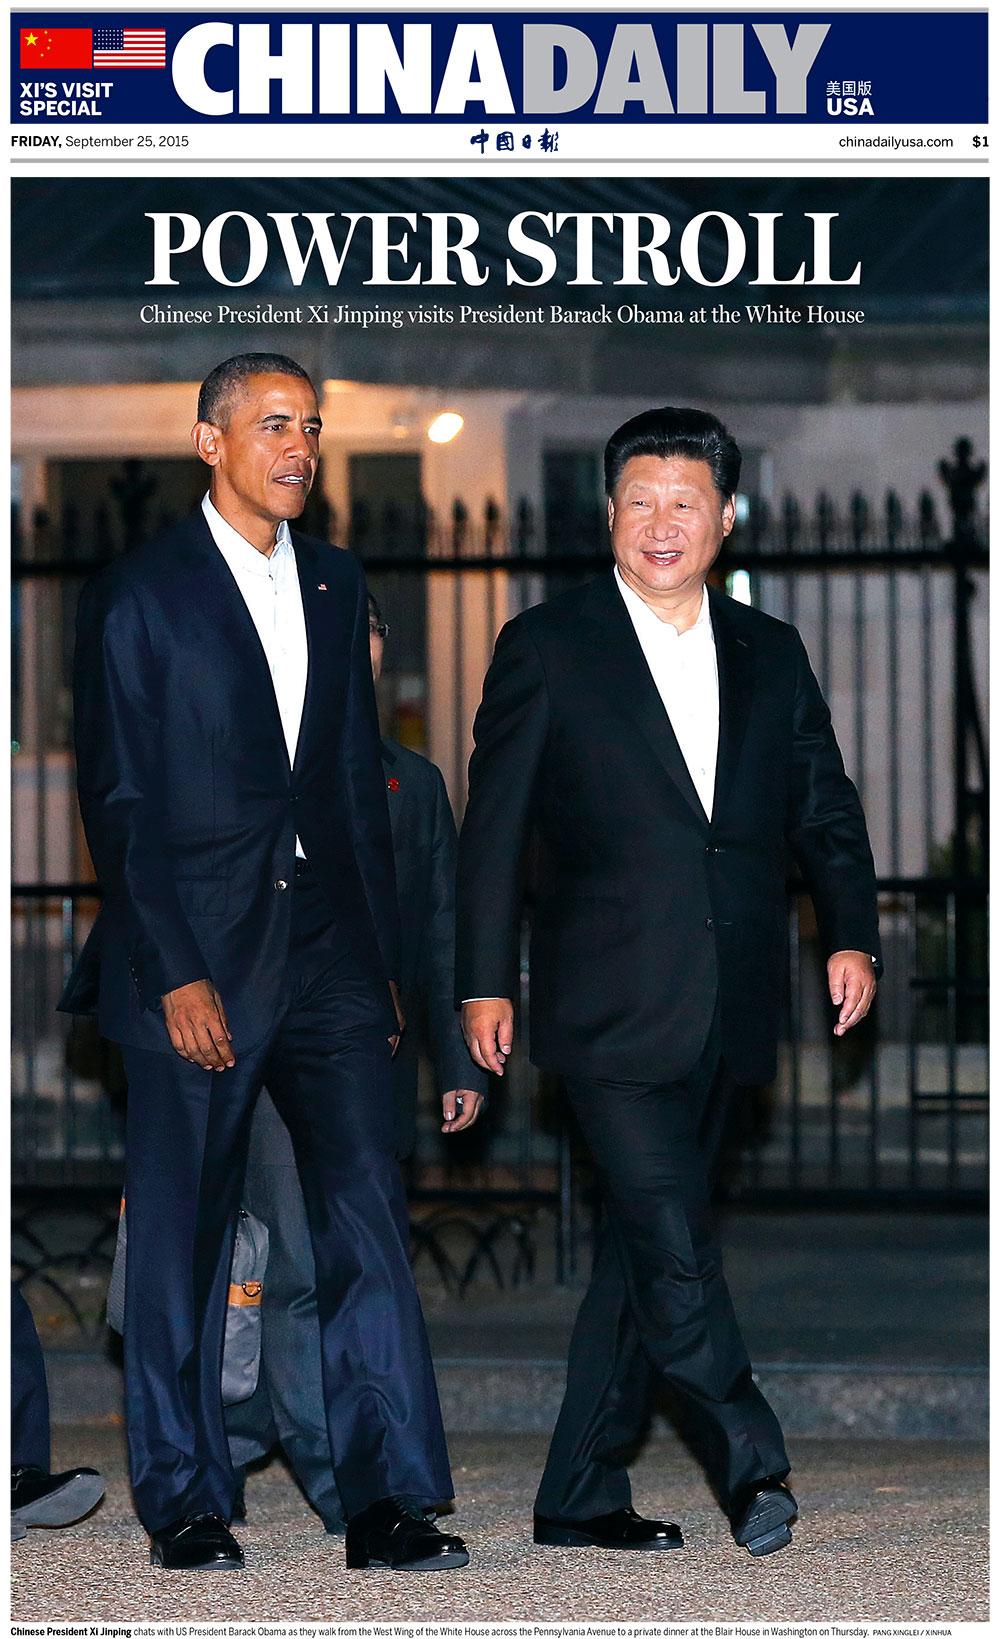 'China Daily,' U.S. edition, September 25, 2015.